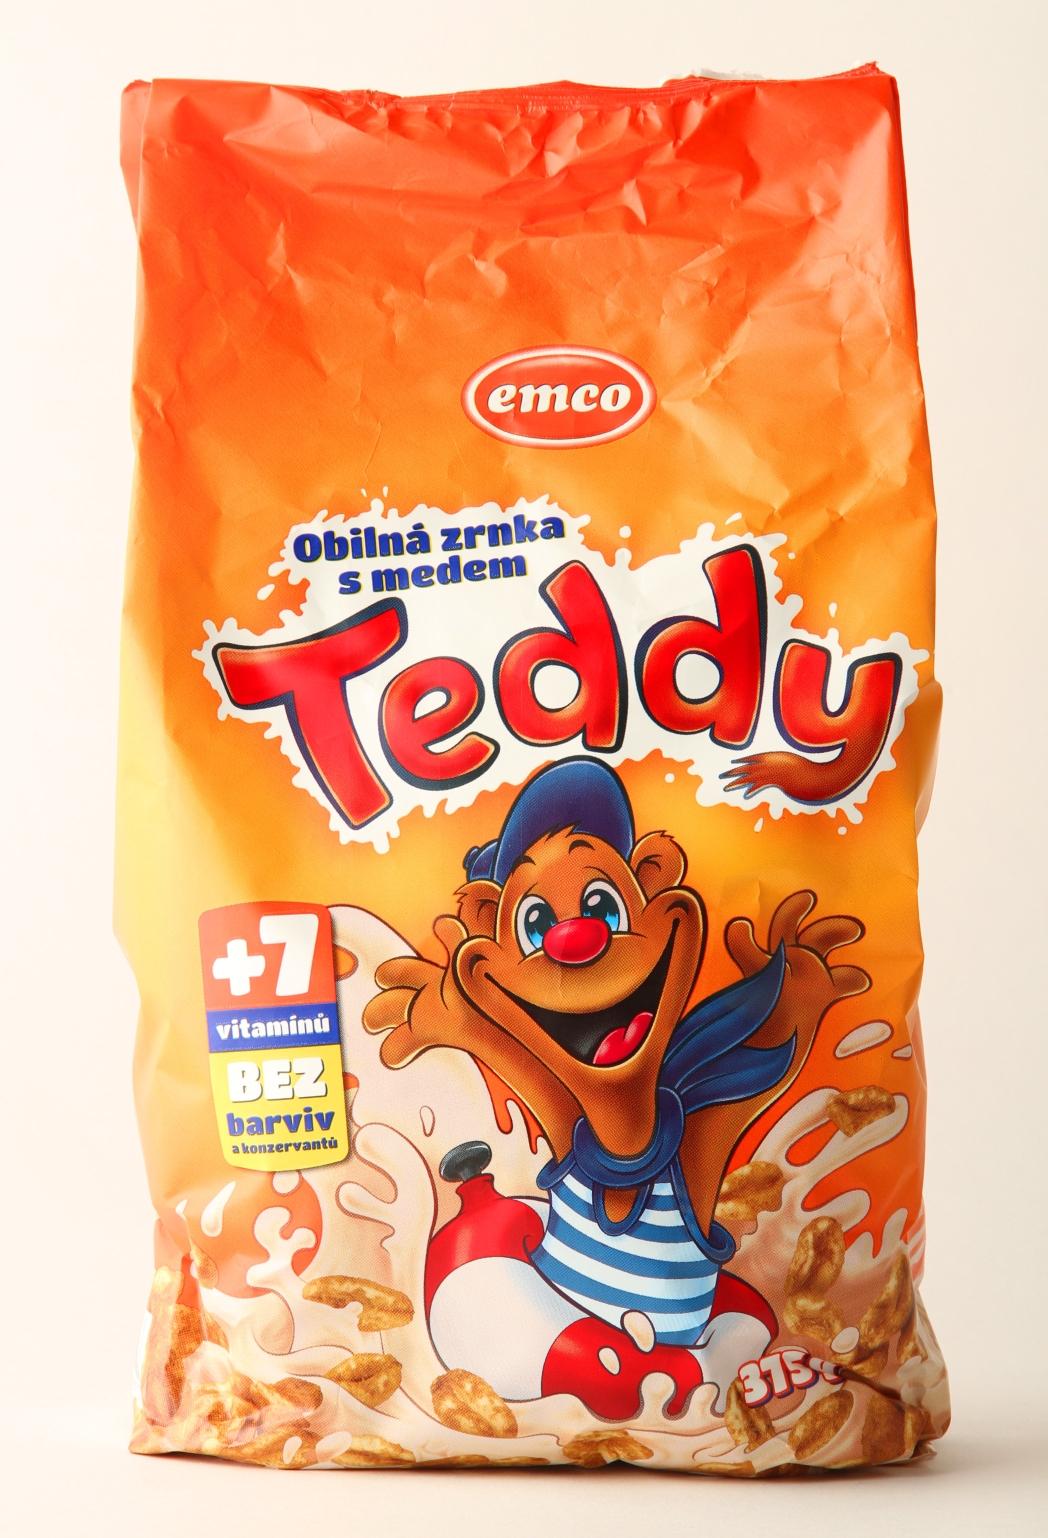 Emco Teddy